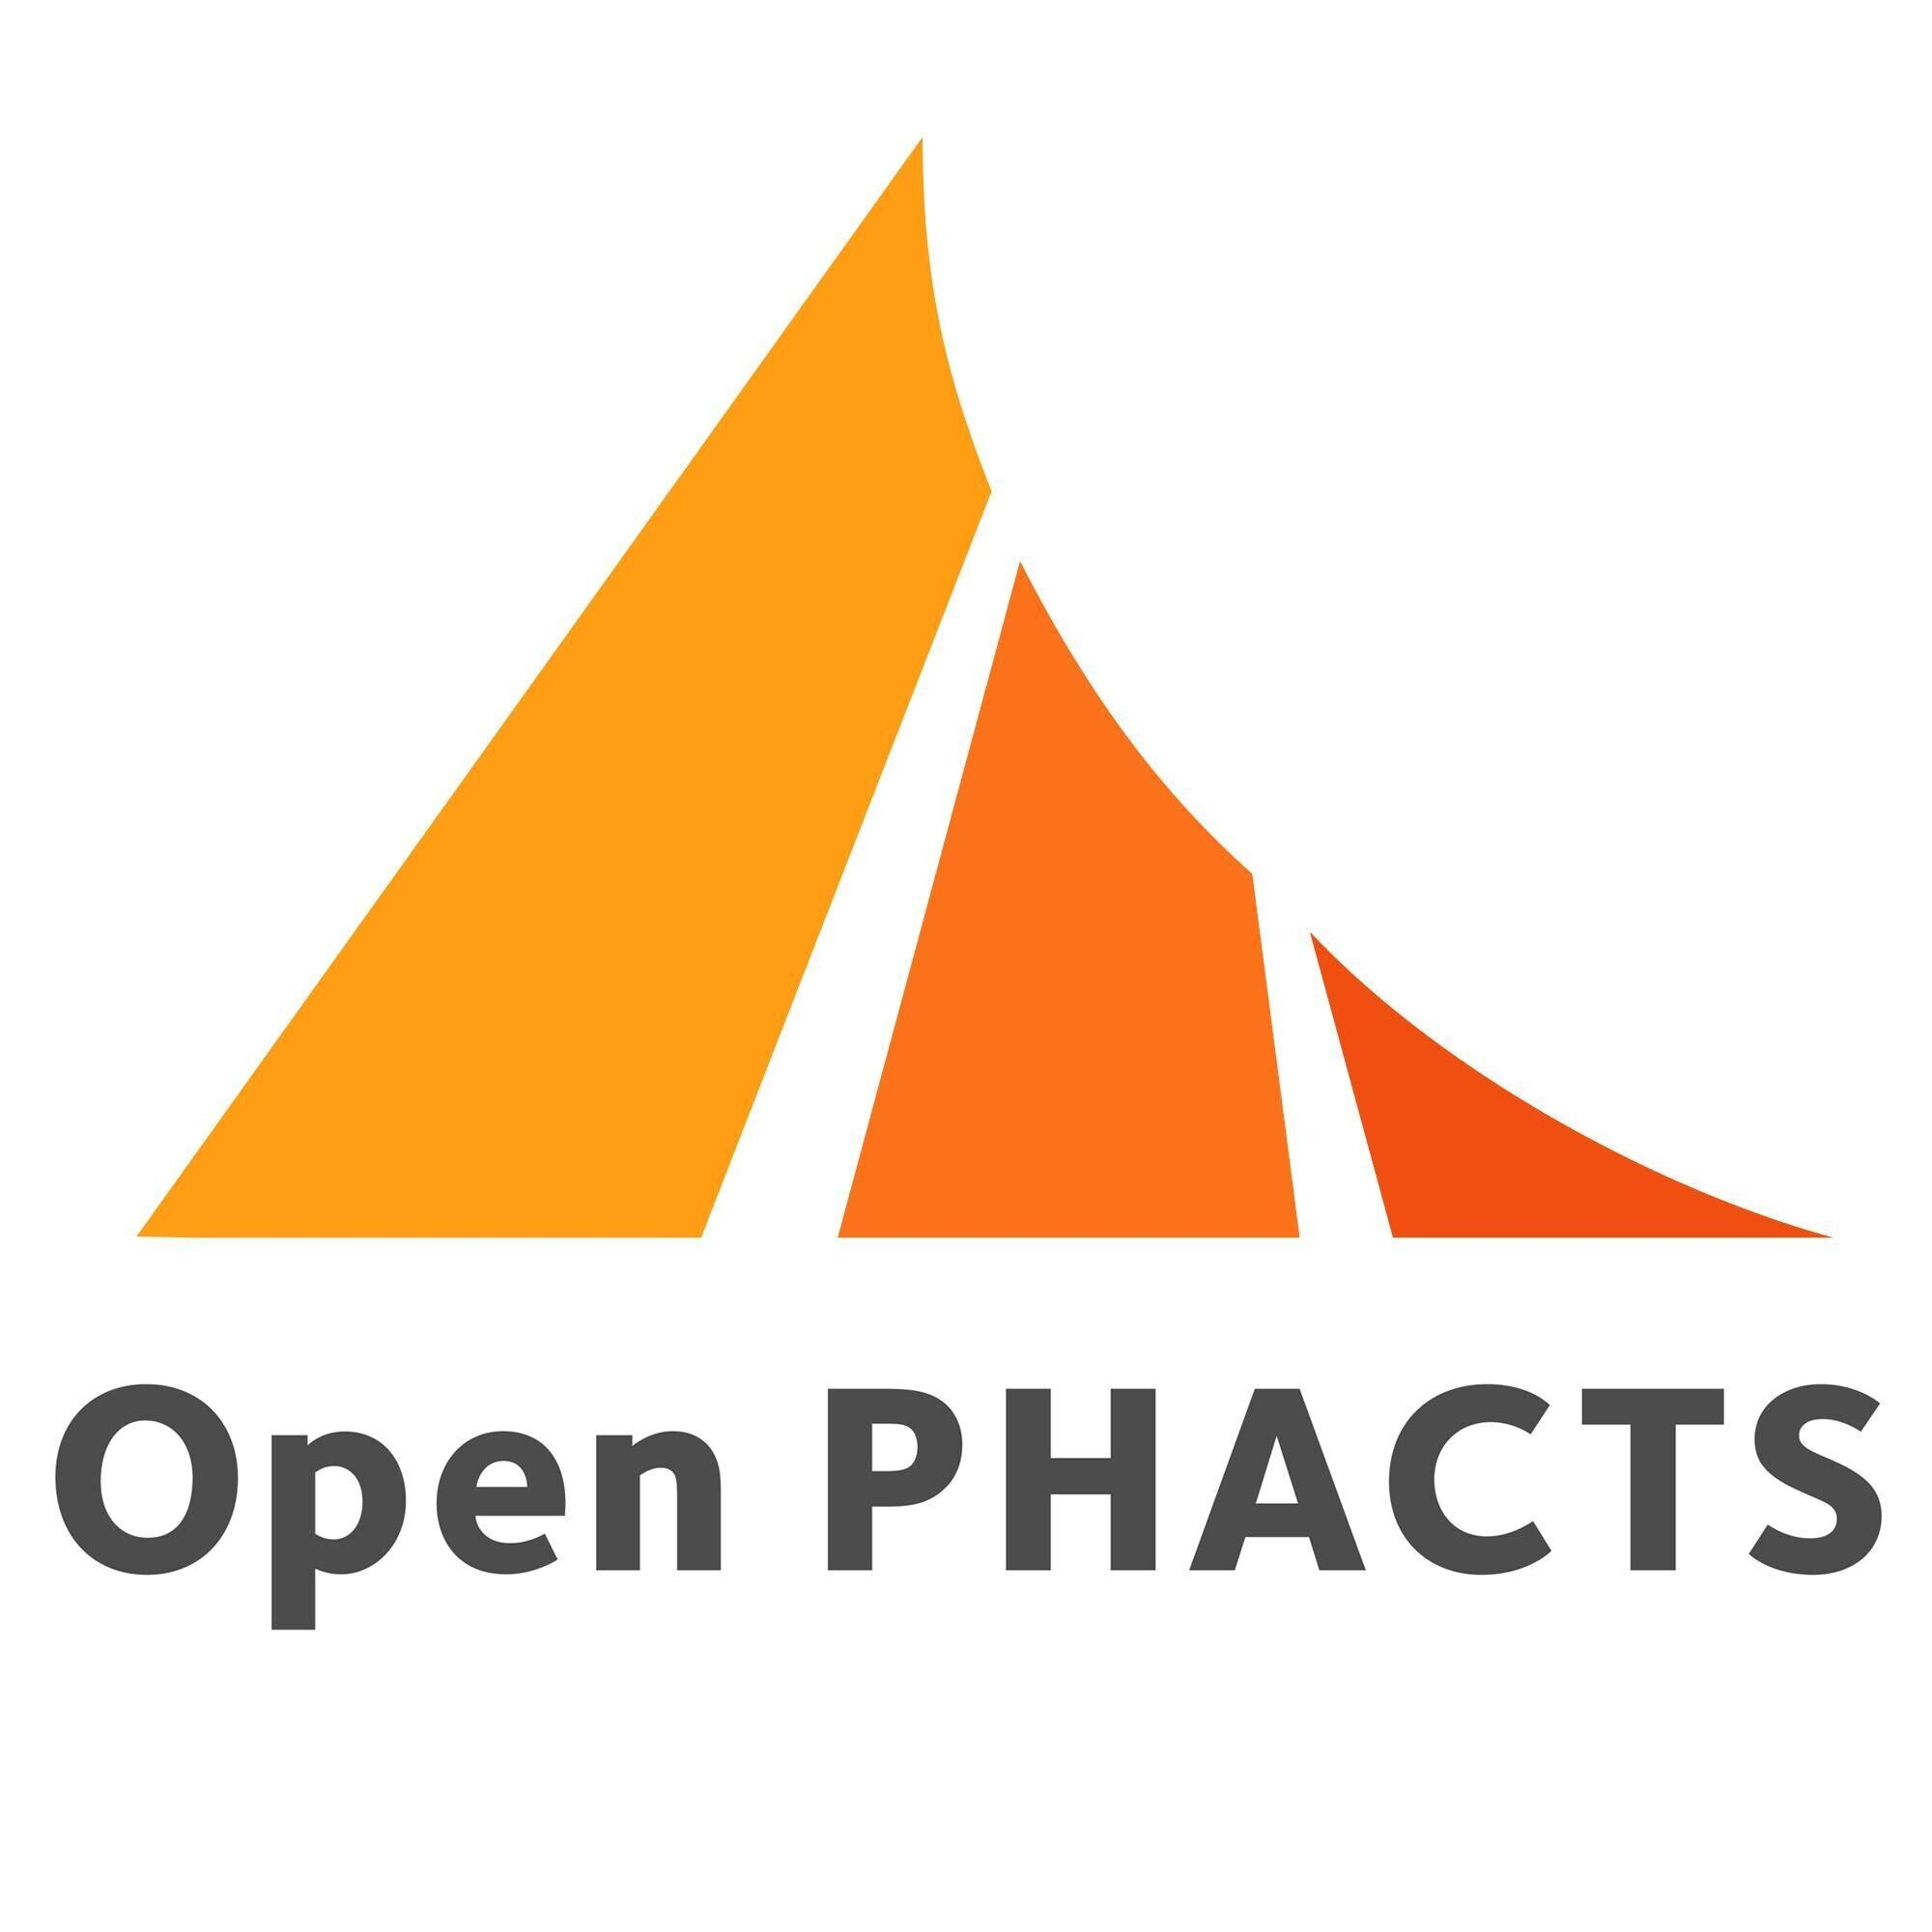 Open PHACTS